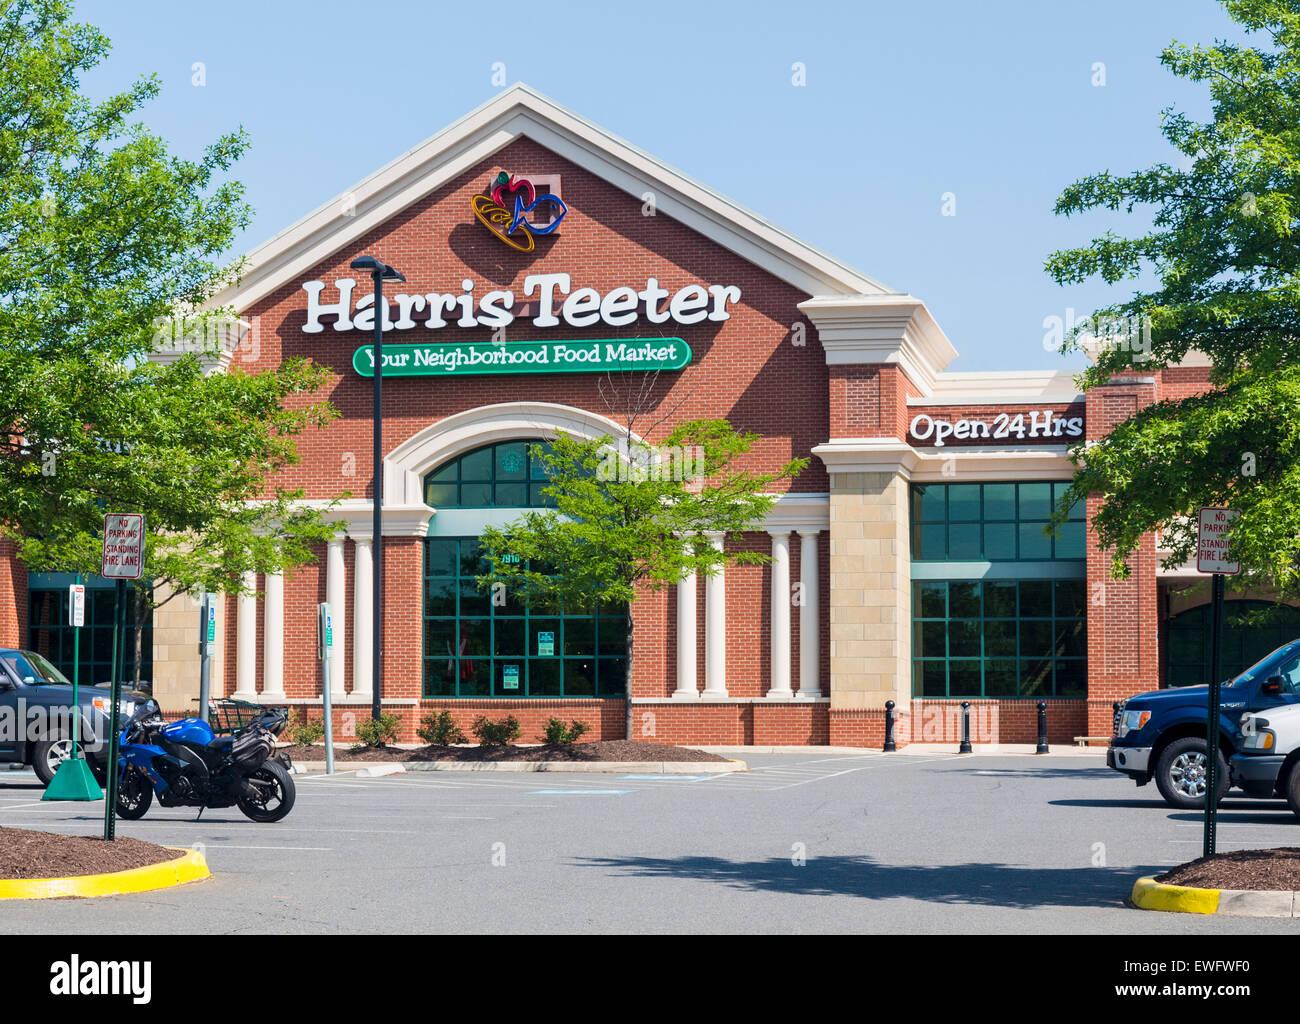 Harris Teeter food supermarket in Gainesville, Virginia, USA - Stock Image